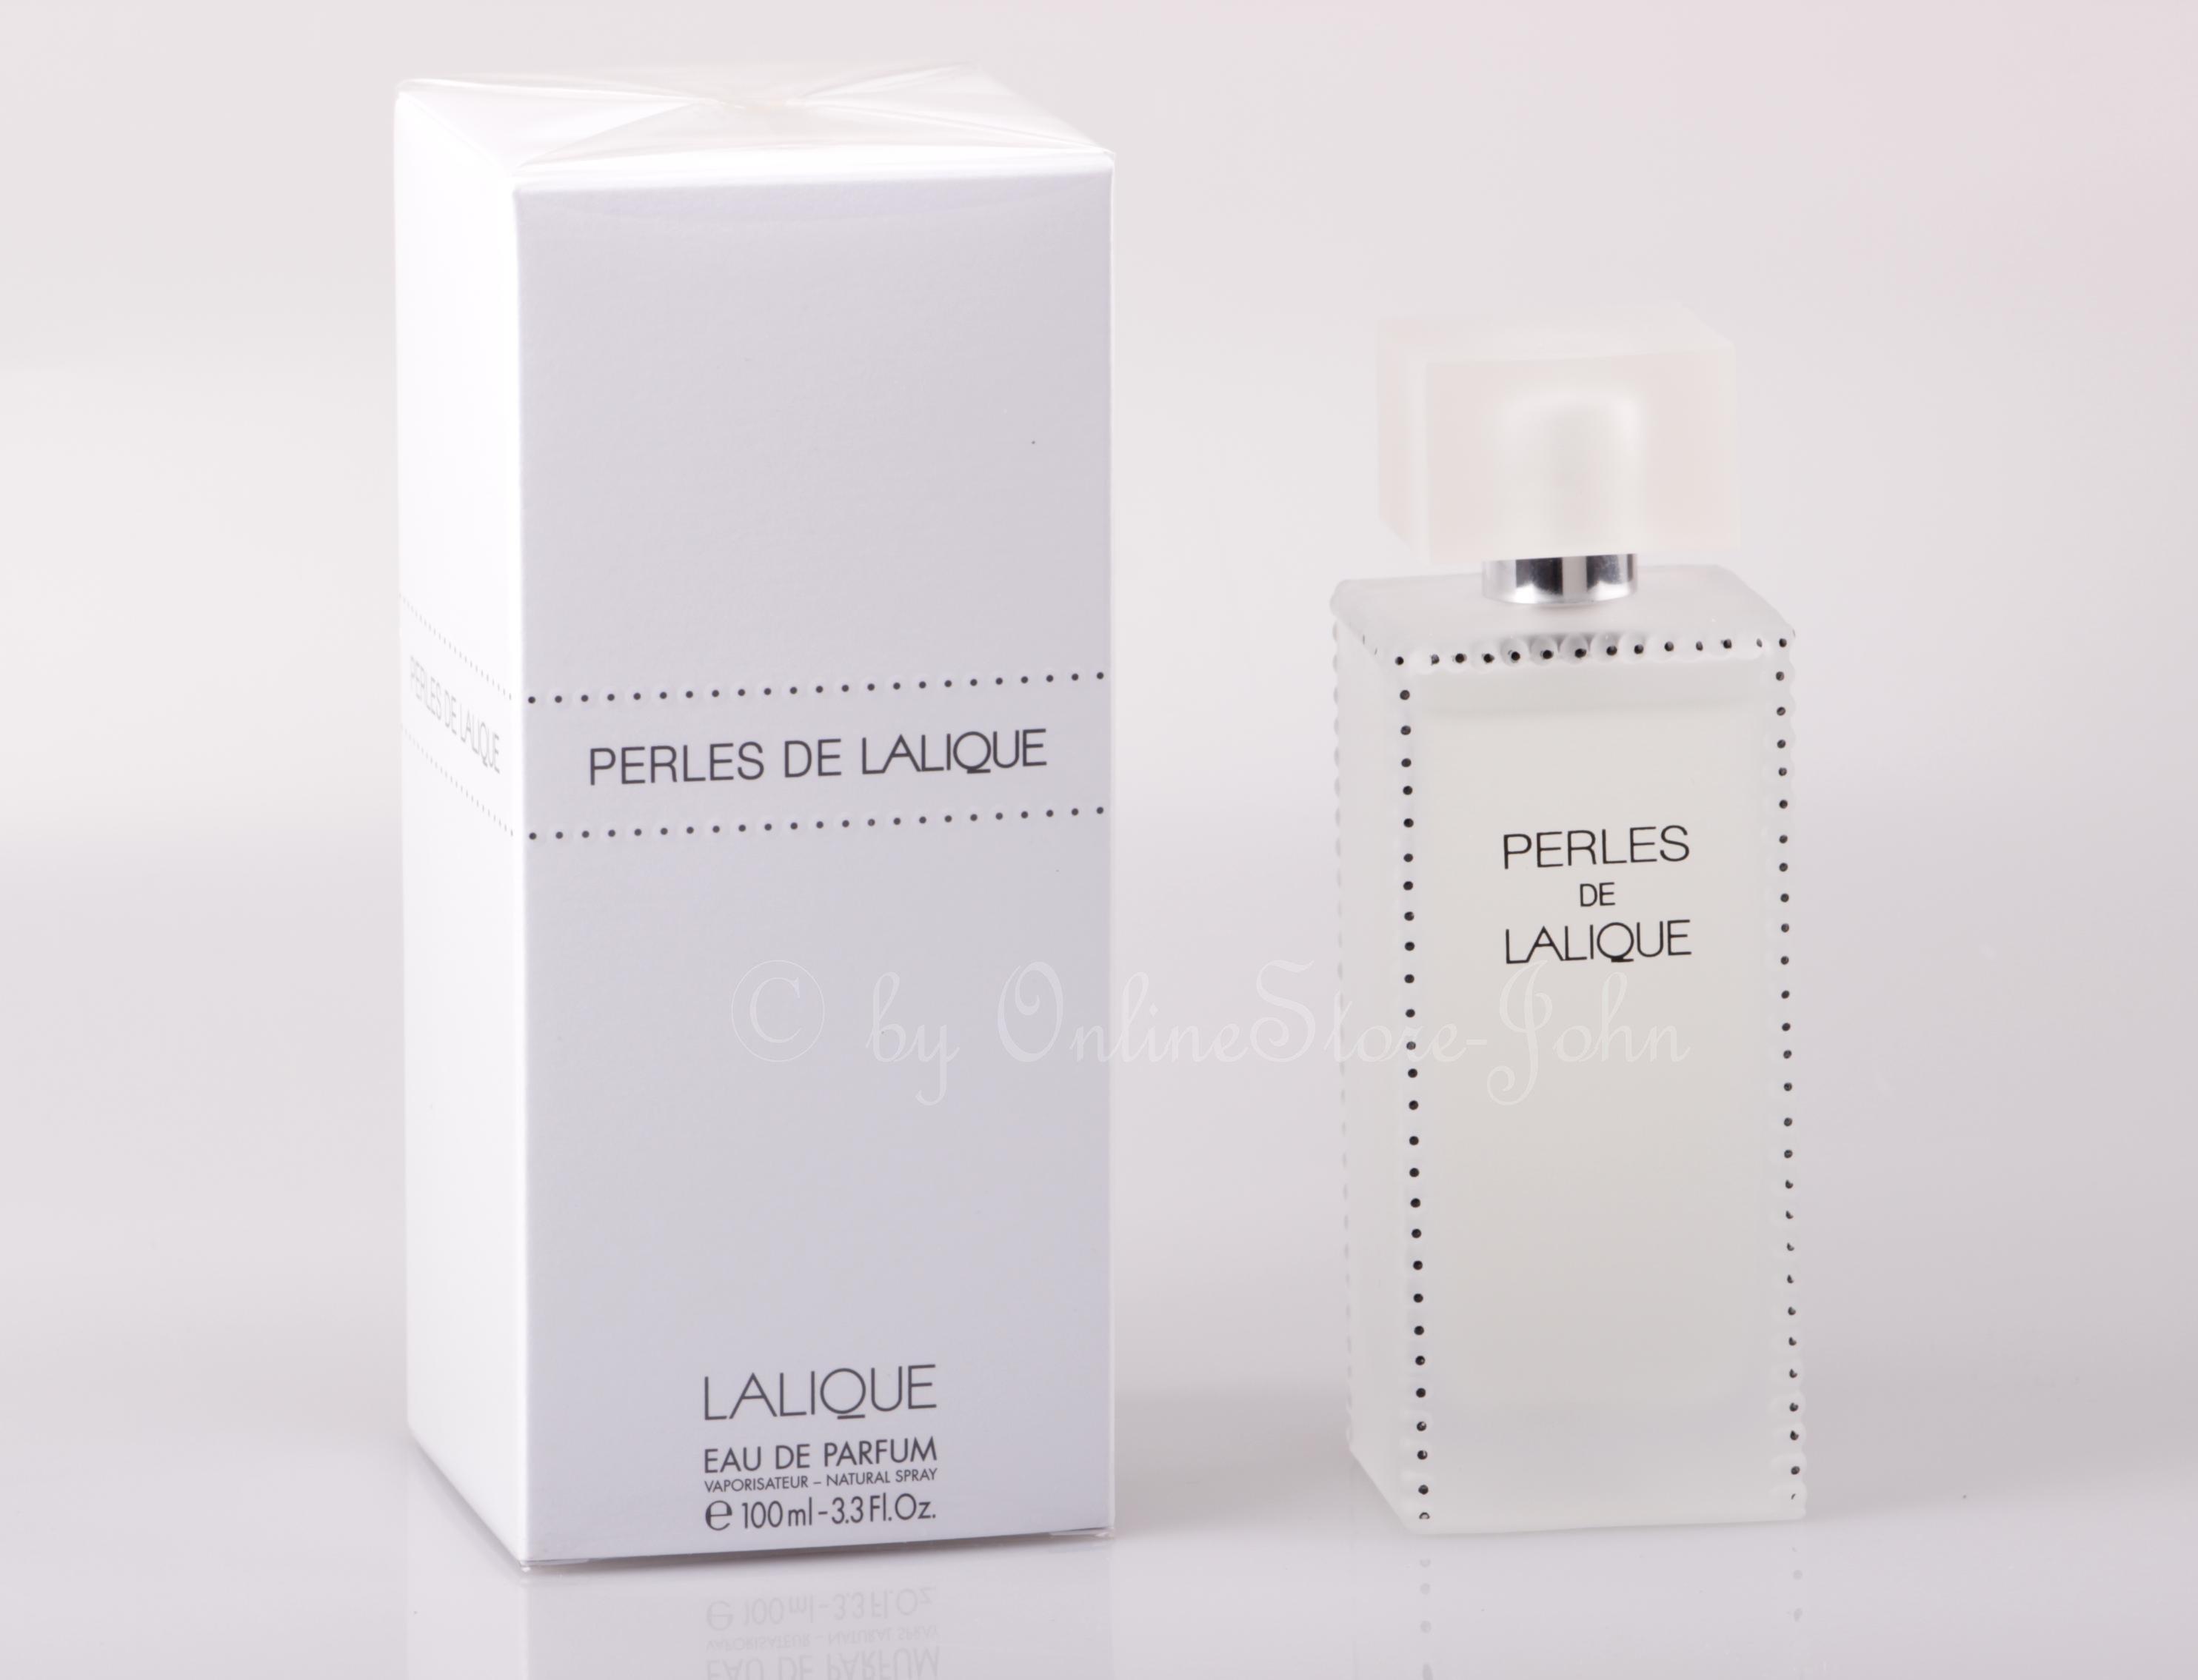 lalique perles de lalique 100ml edp eau de parfum neu ovp ebay. Black Bedroom Furniture Sets. Home Design Ideas